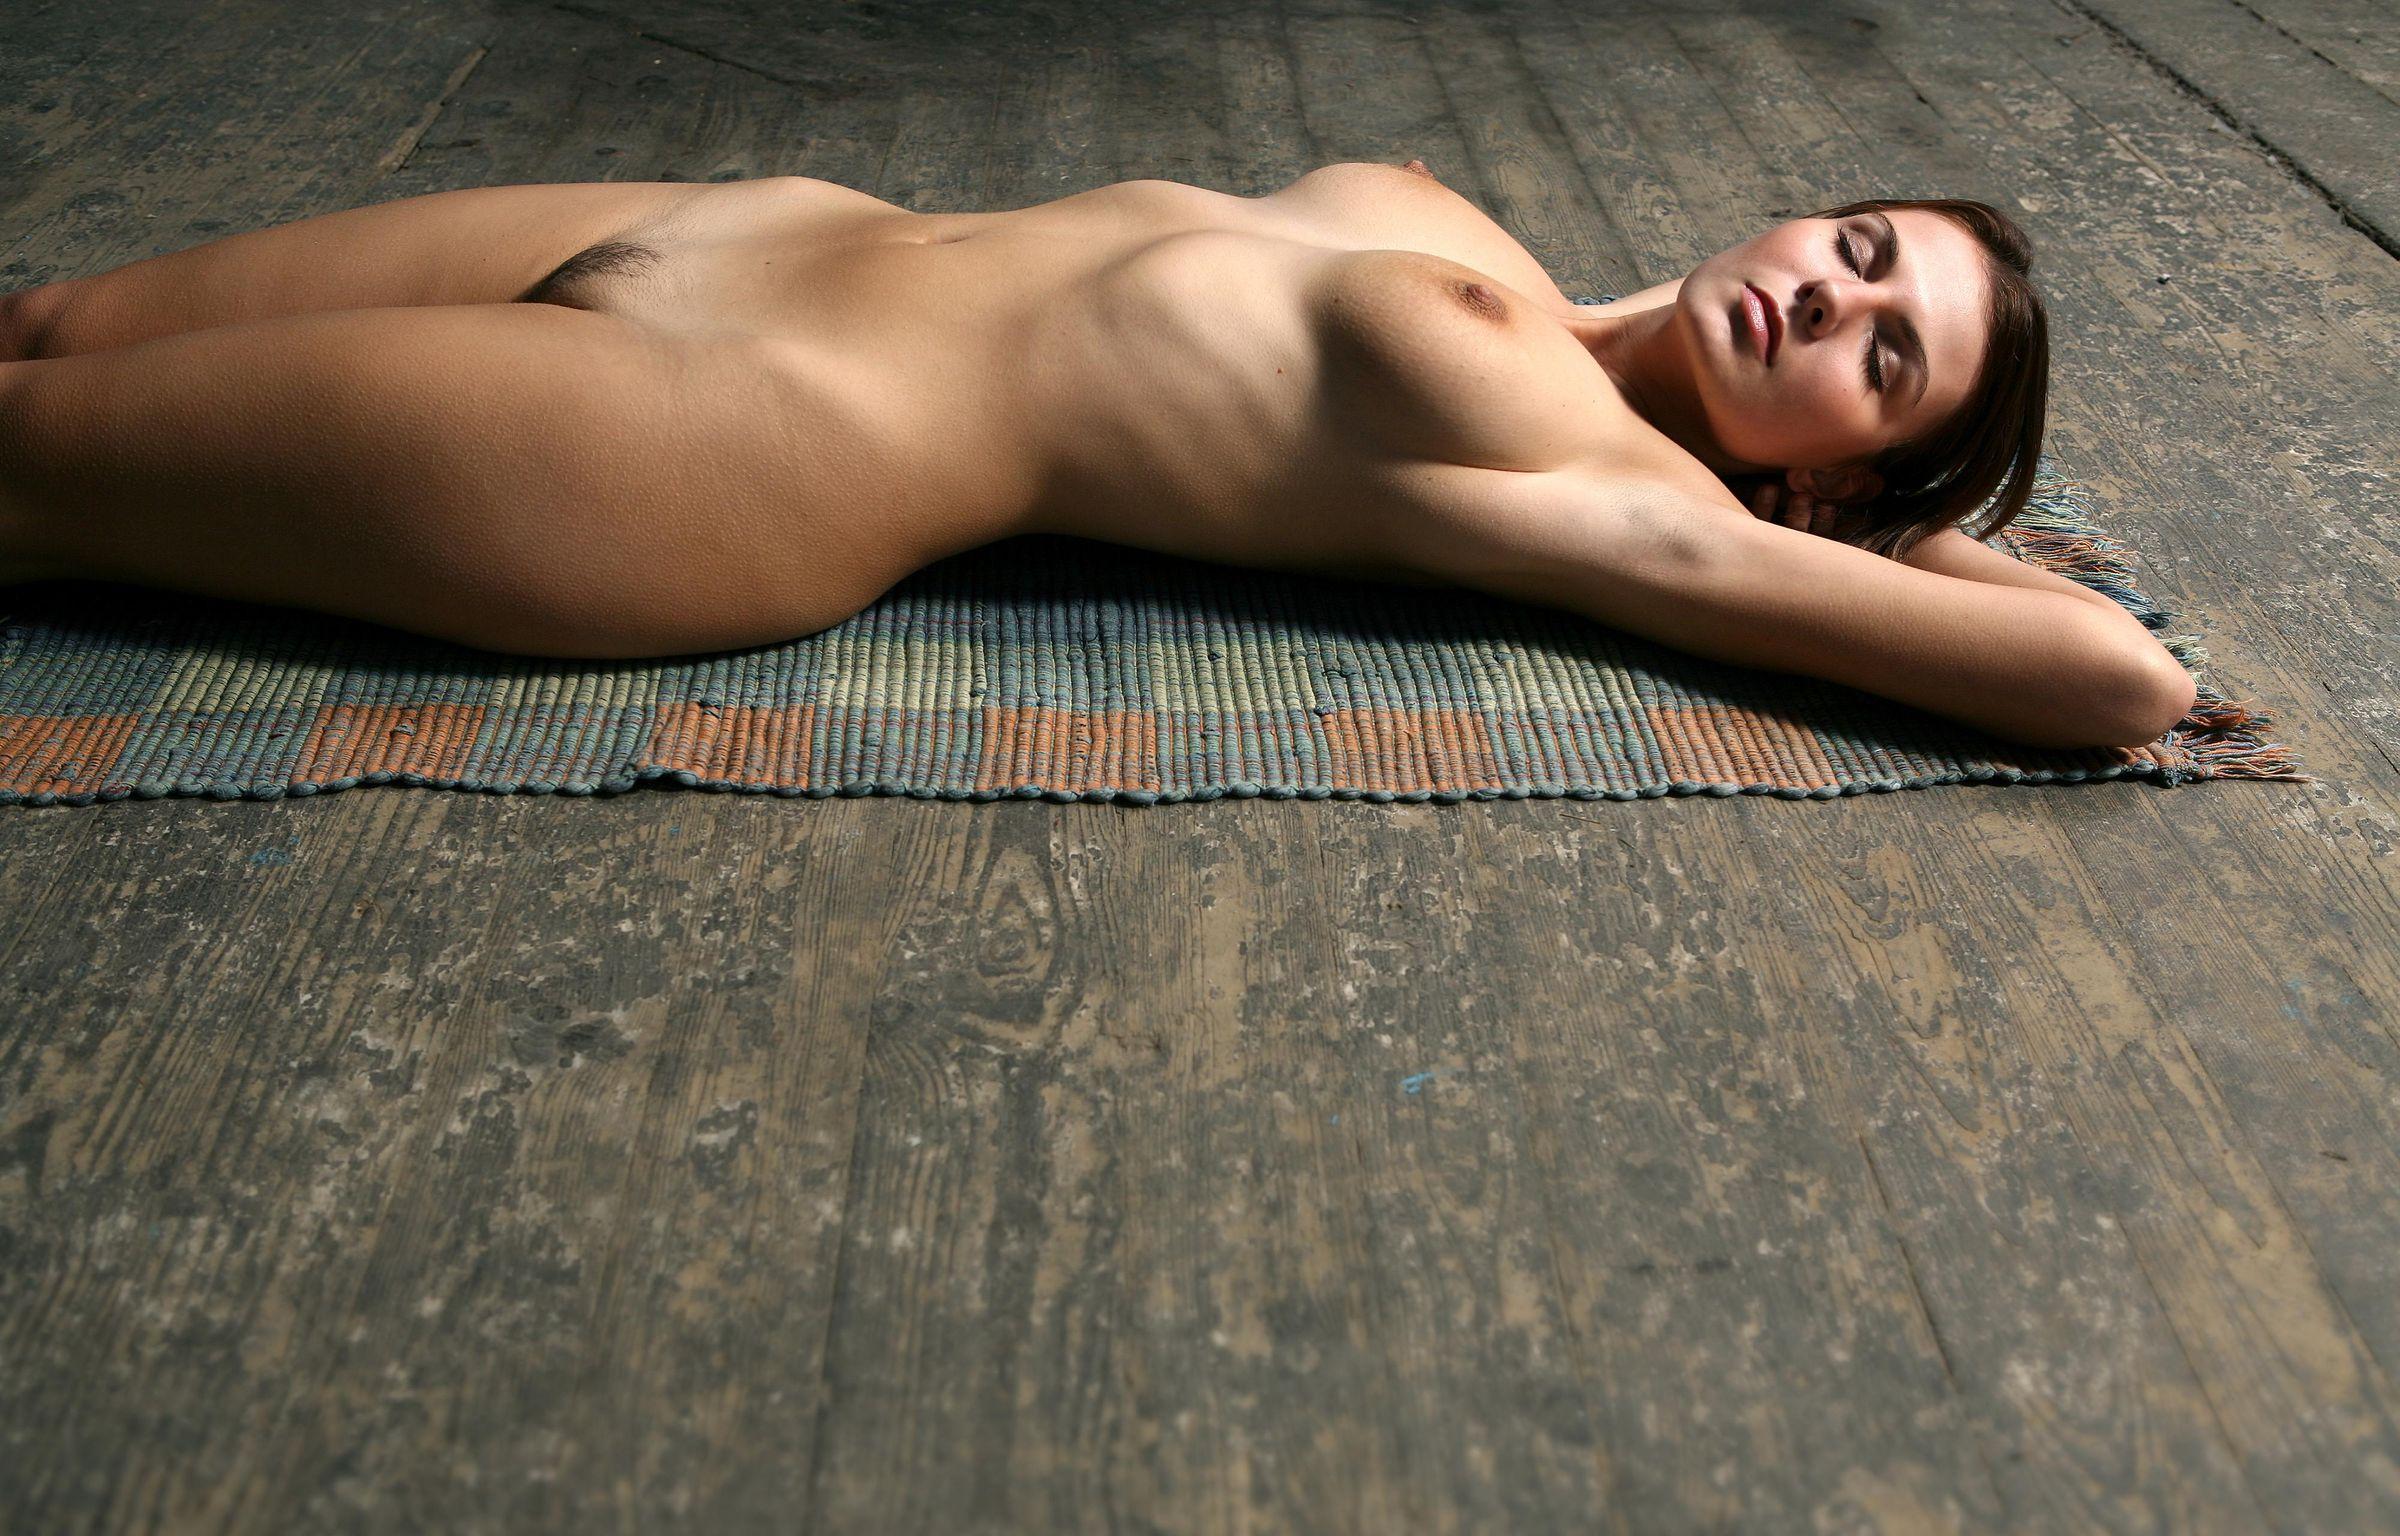 Laura marino naked — photo 15